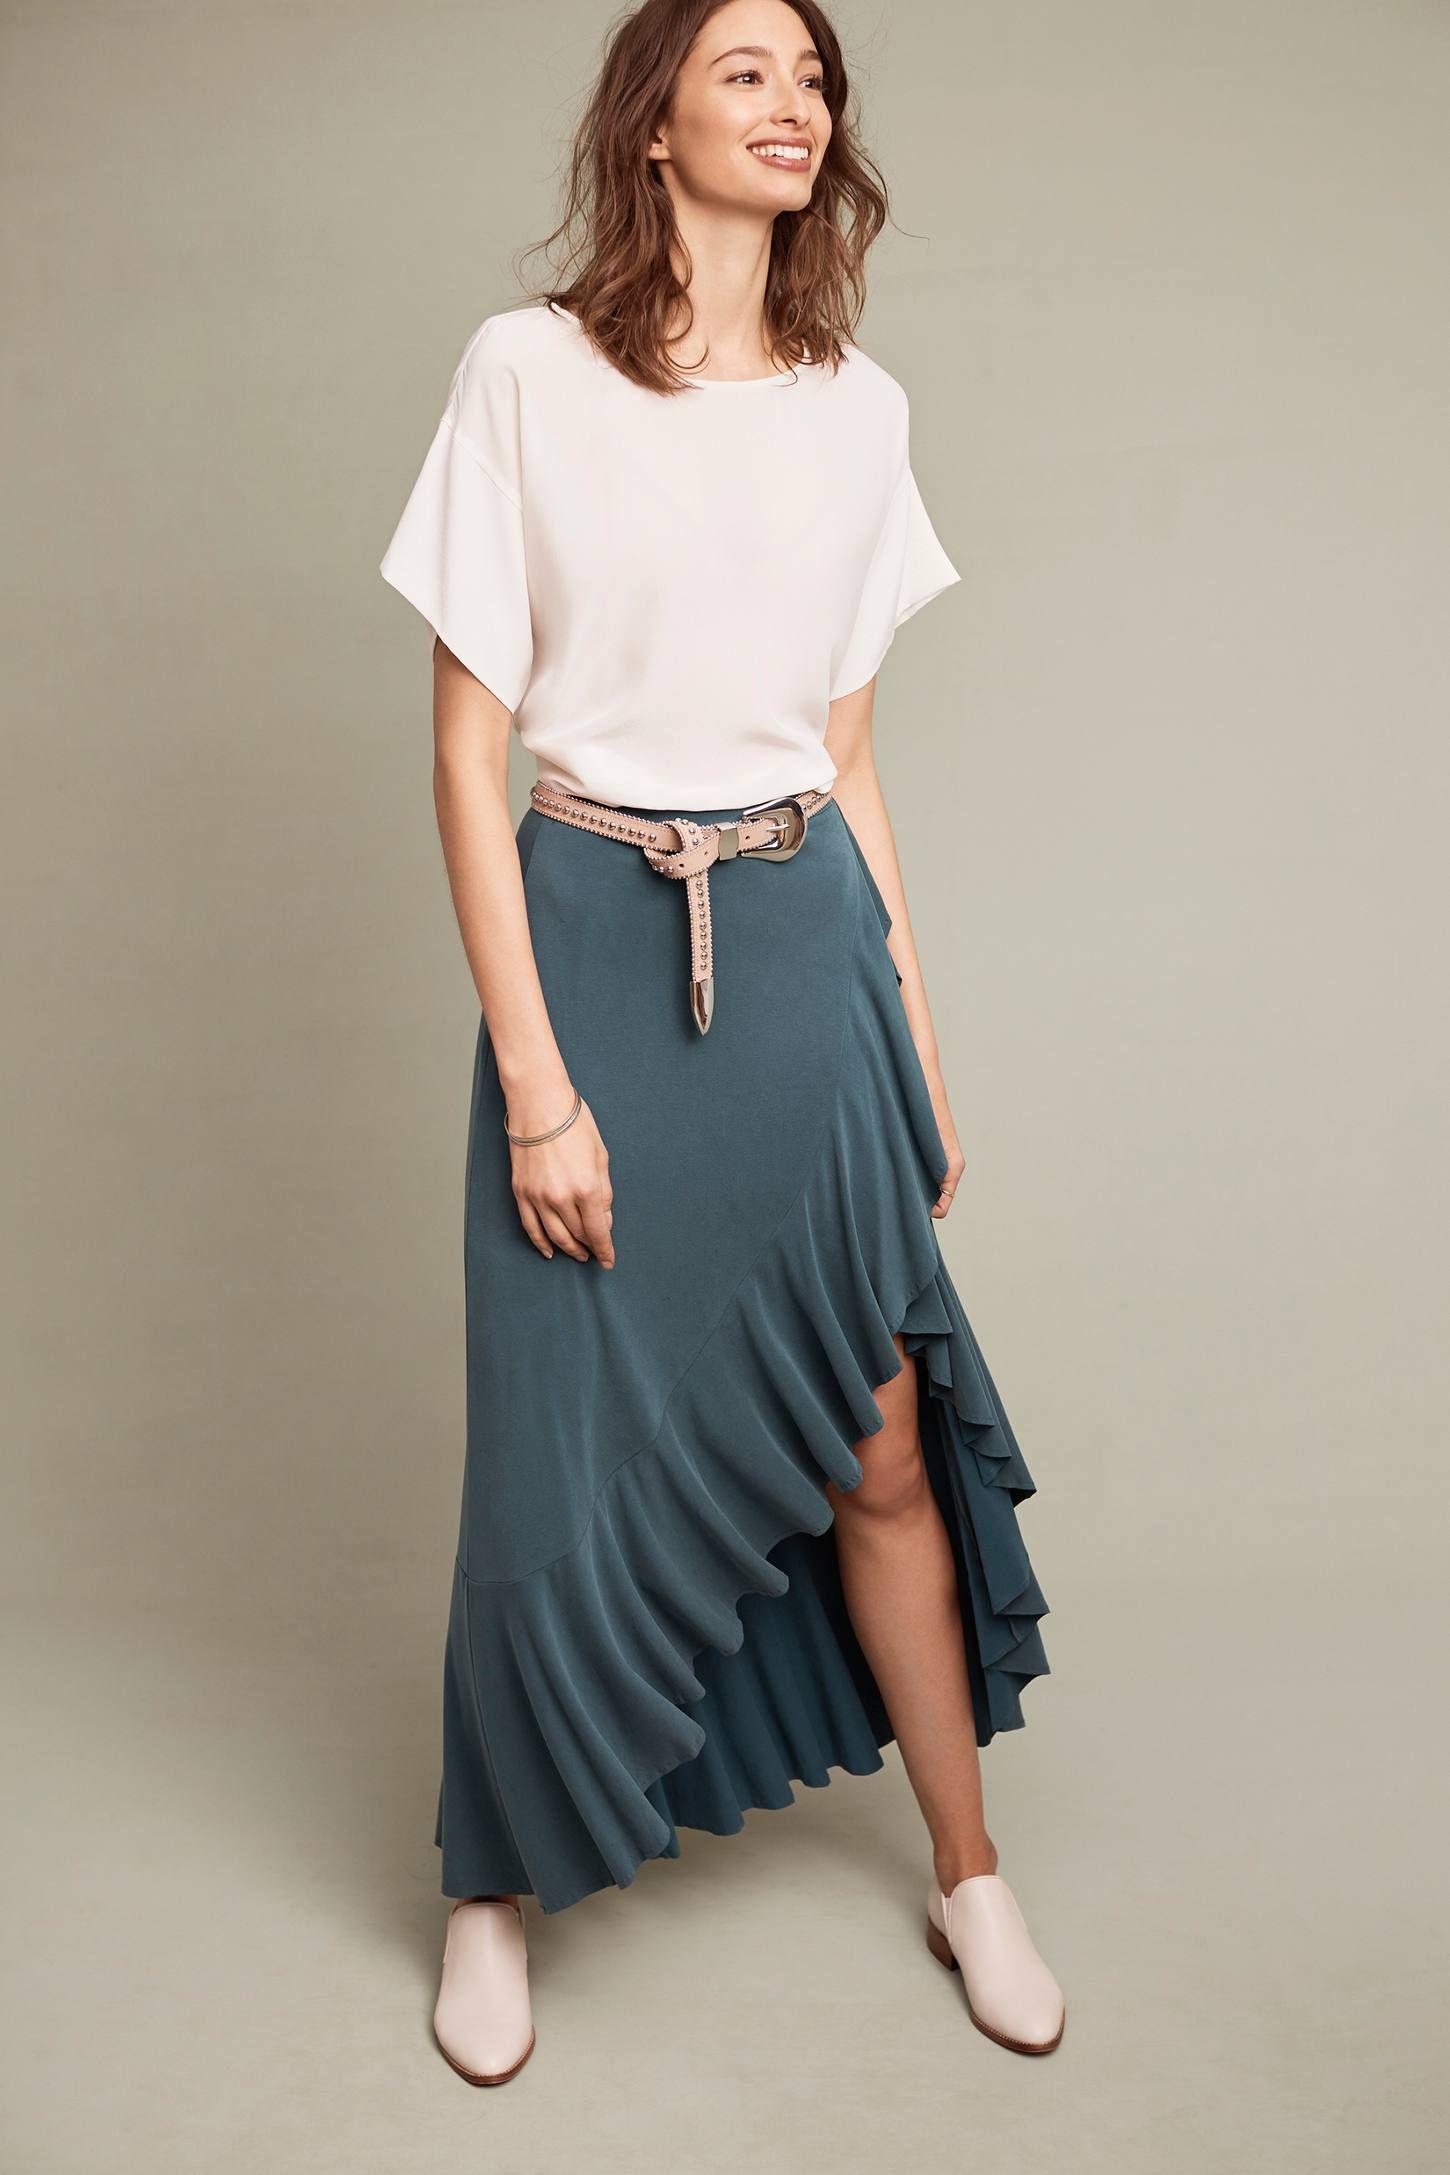 Ruffled maxi skirt pinterest anthropologie ruffles and detail